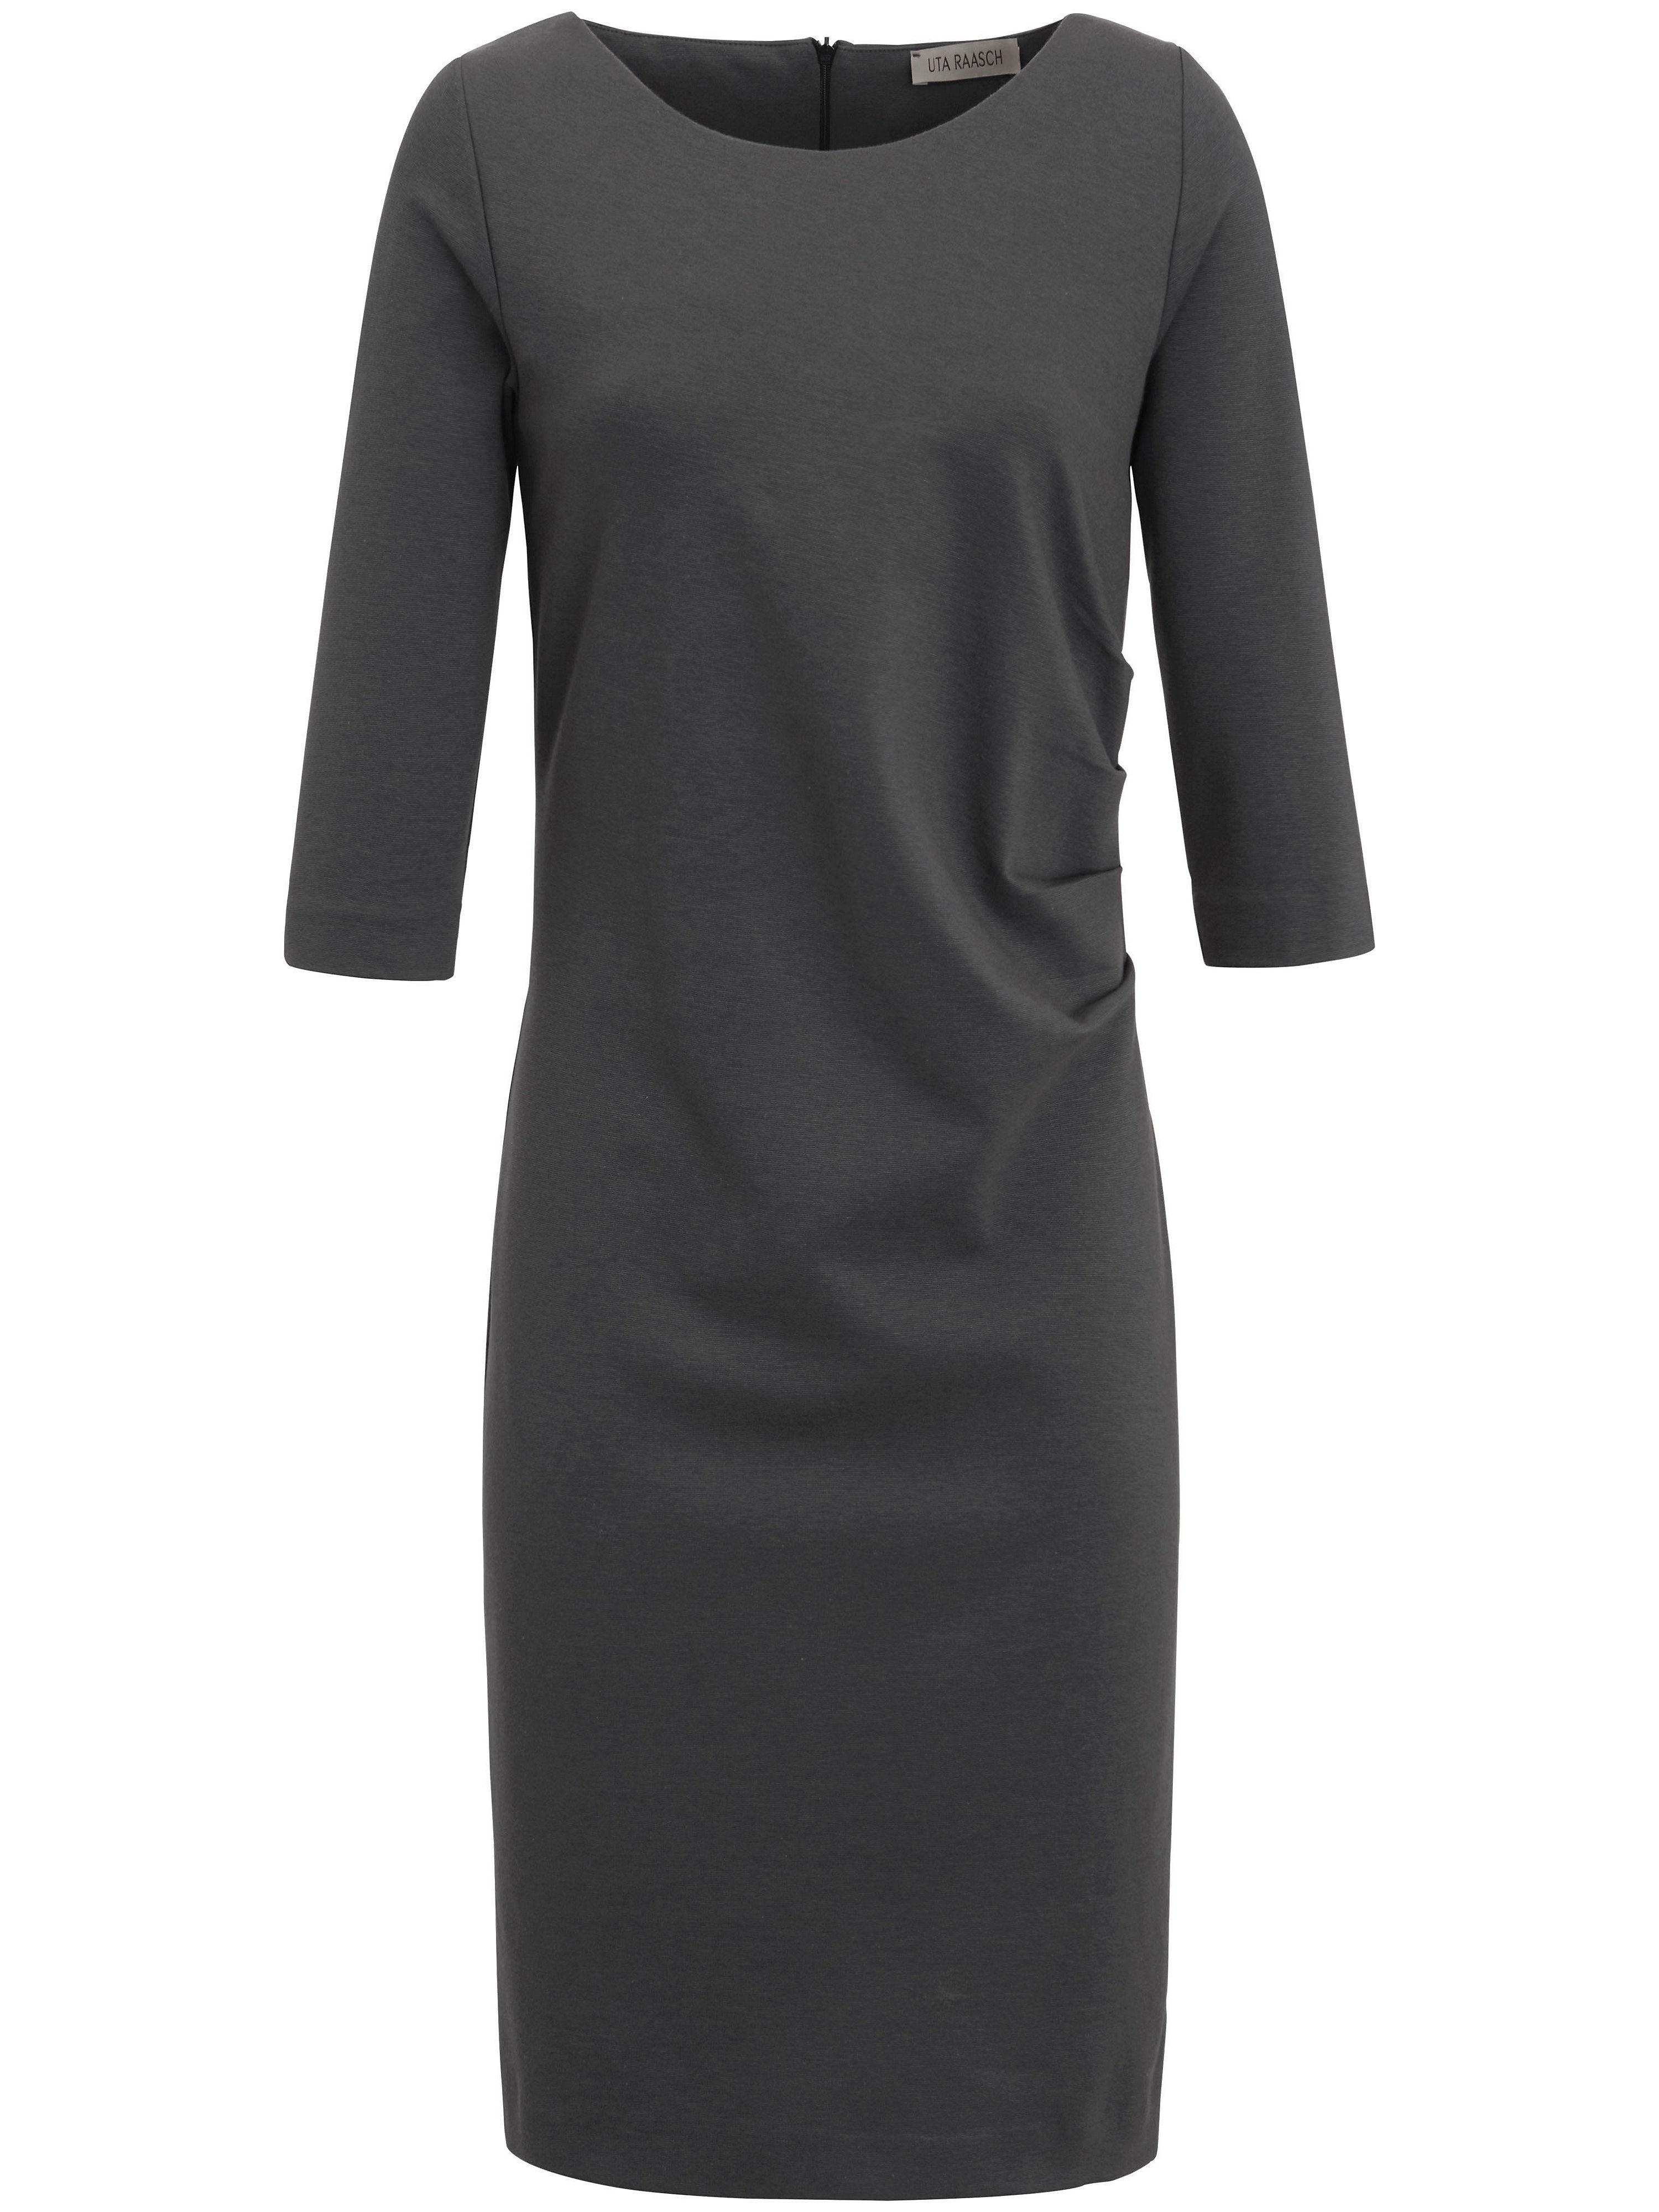 Image of   Jerseykjole i elegant look Fra Uta Raasch grå